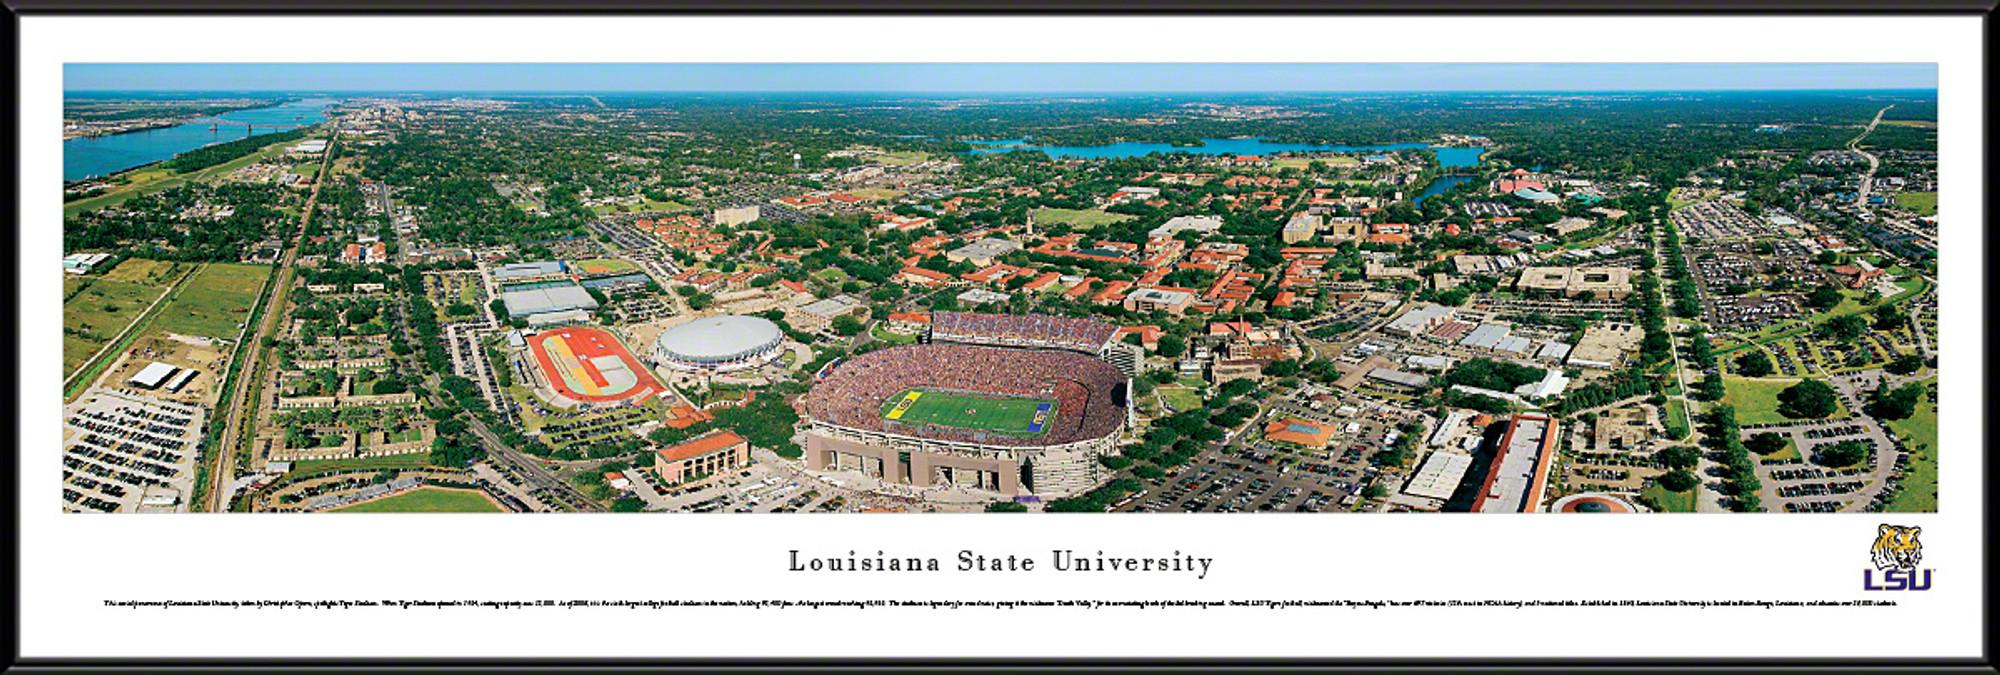 LSU Tigers Standard Frame Panoramic Photo - Aerial View